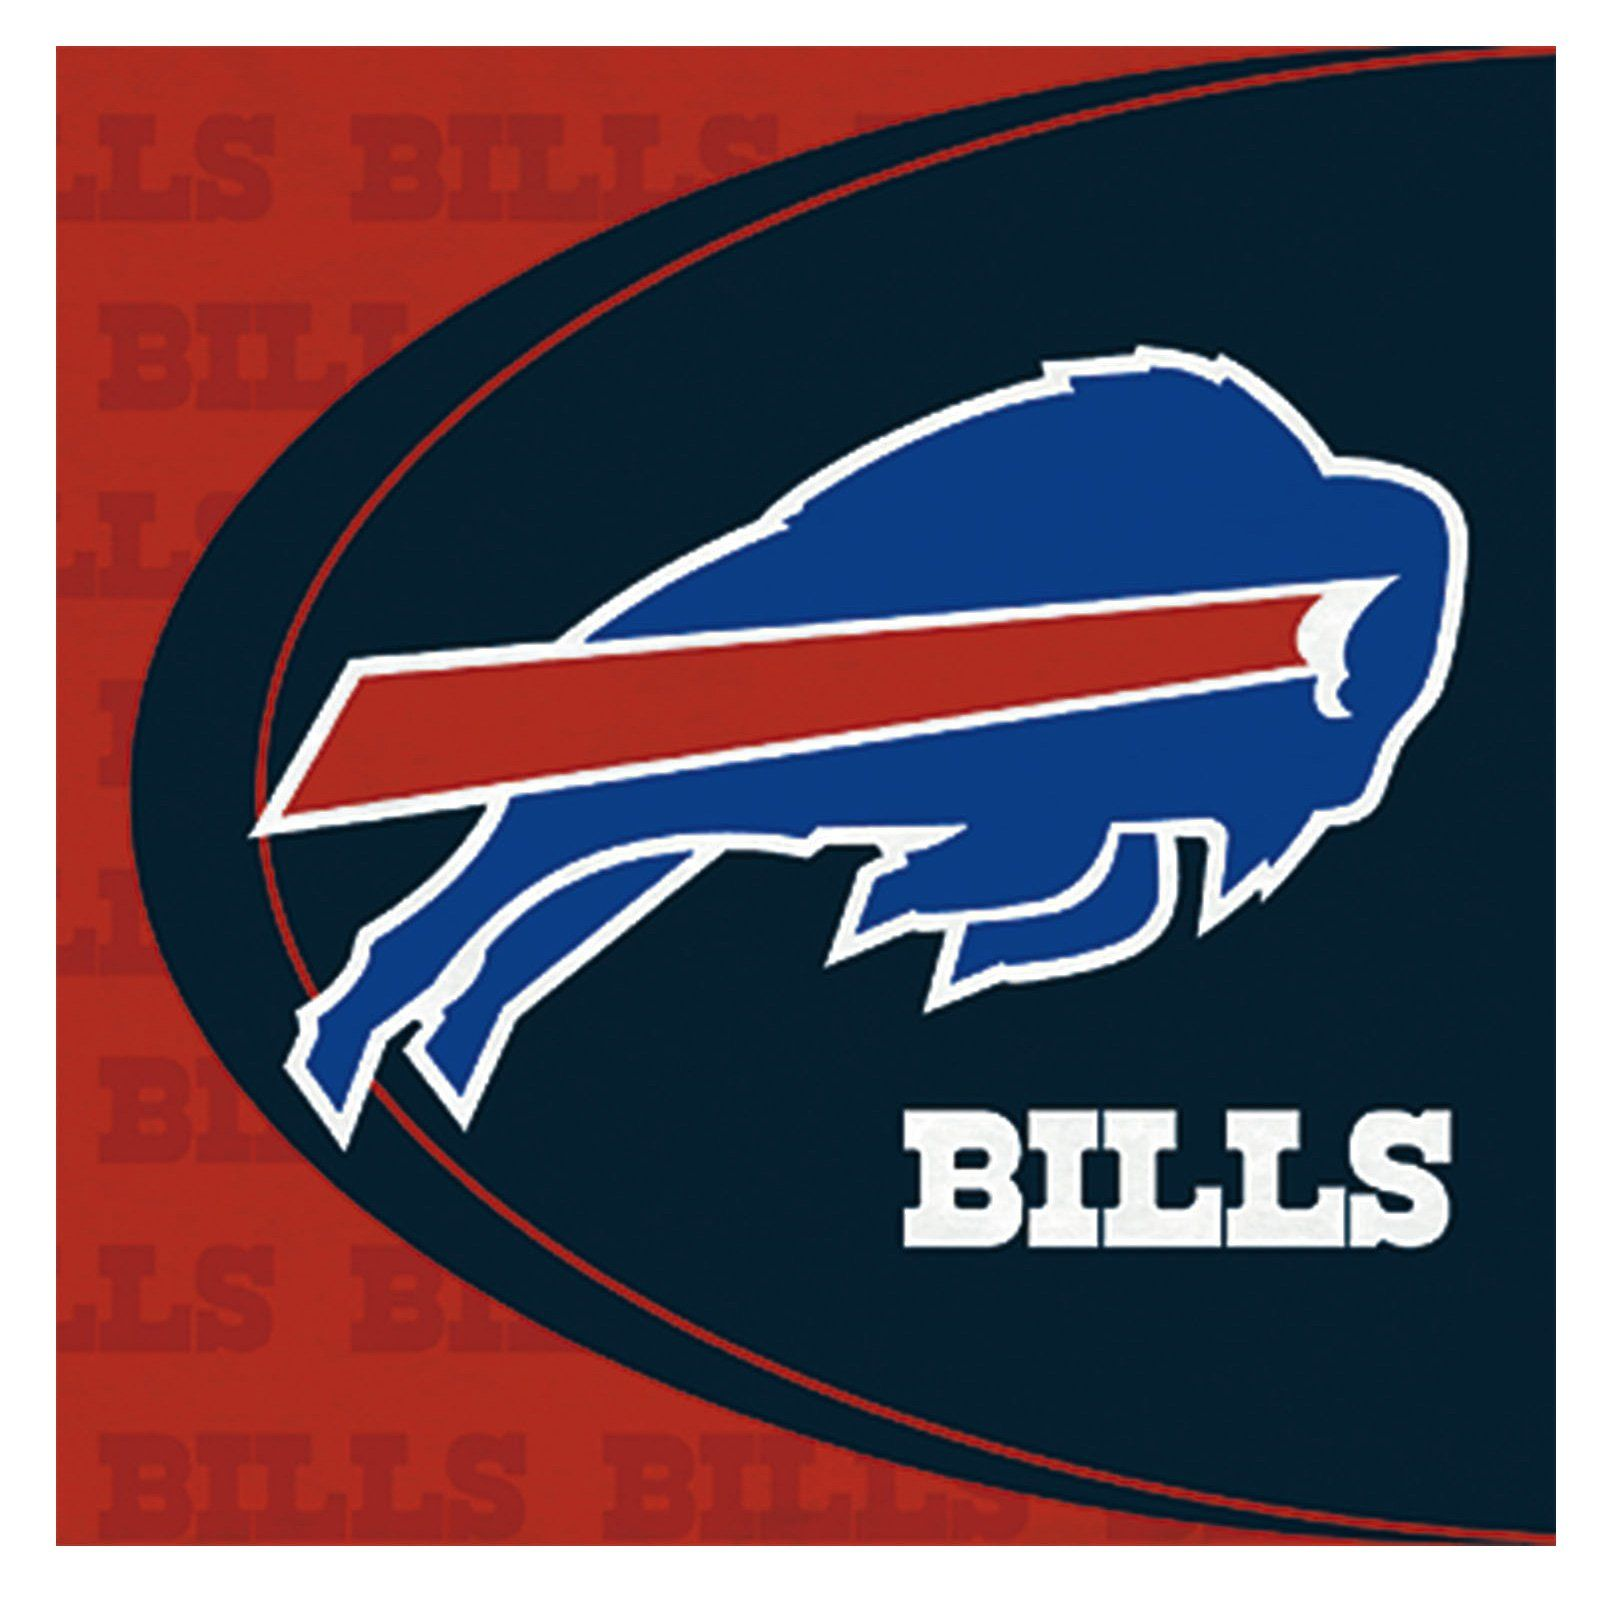 Buffalo bills buffalo bills buffalo bills baby buffalo